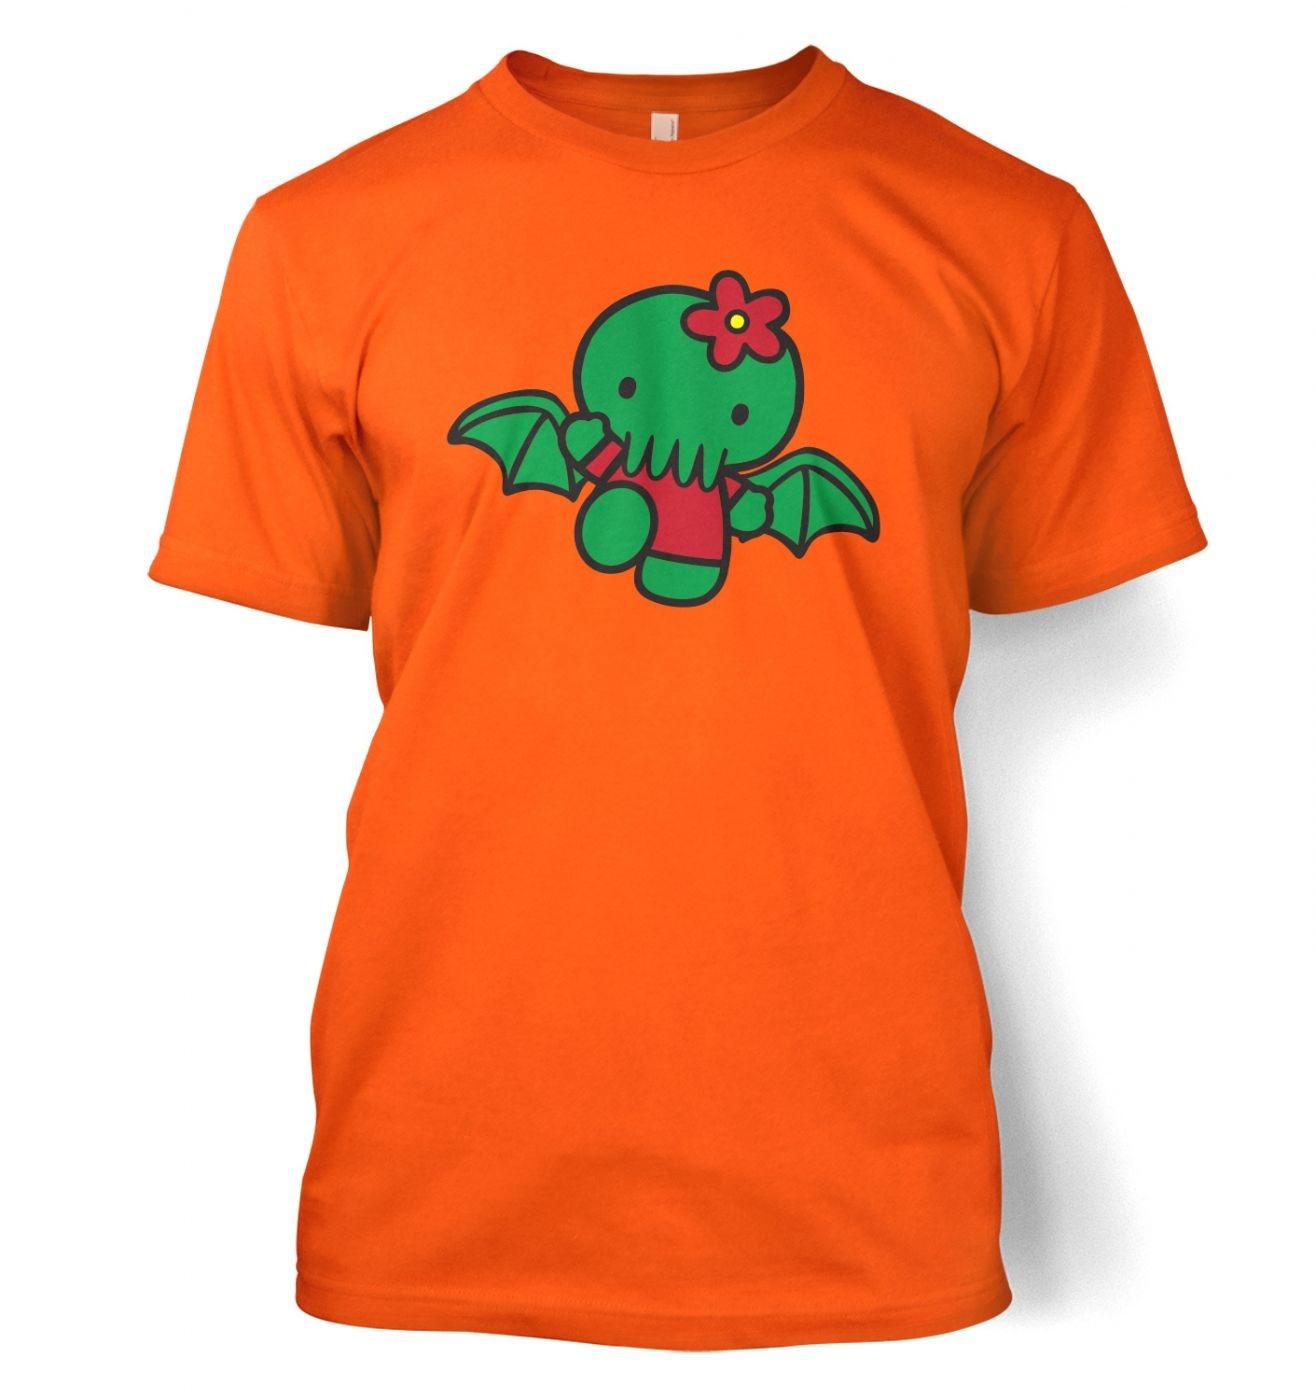 Hello Cthulhu t-shirt